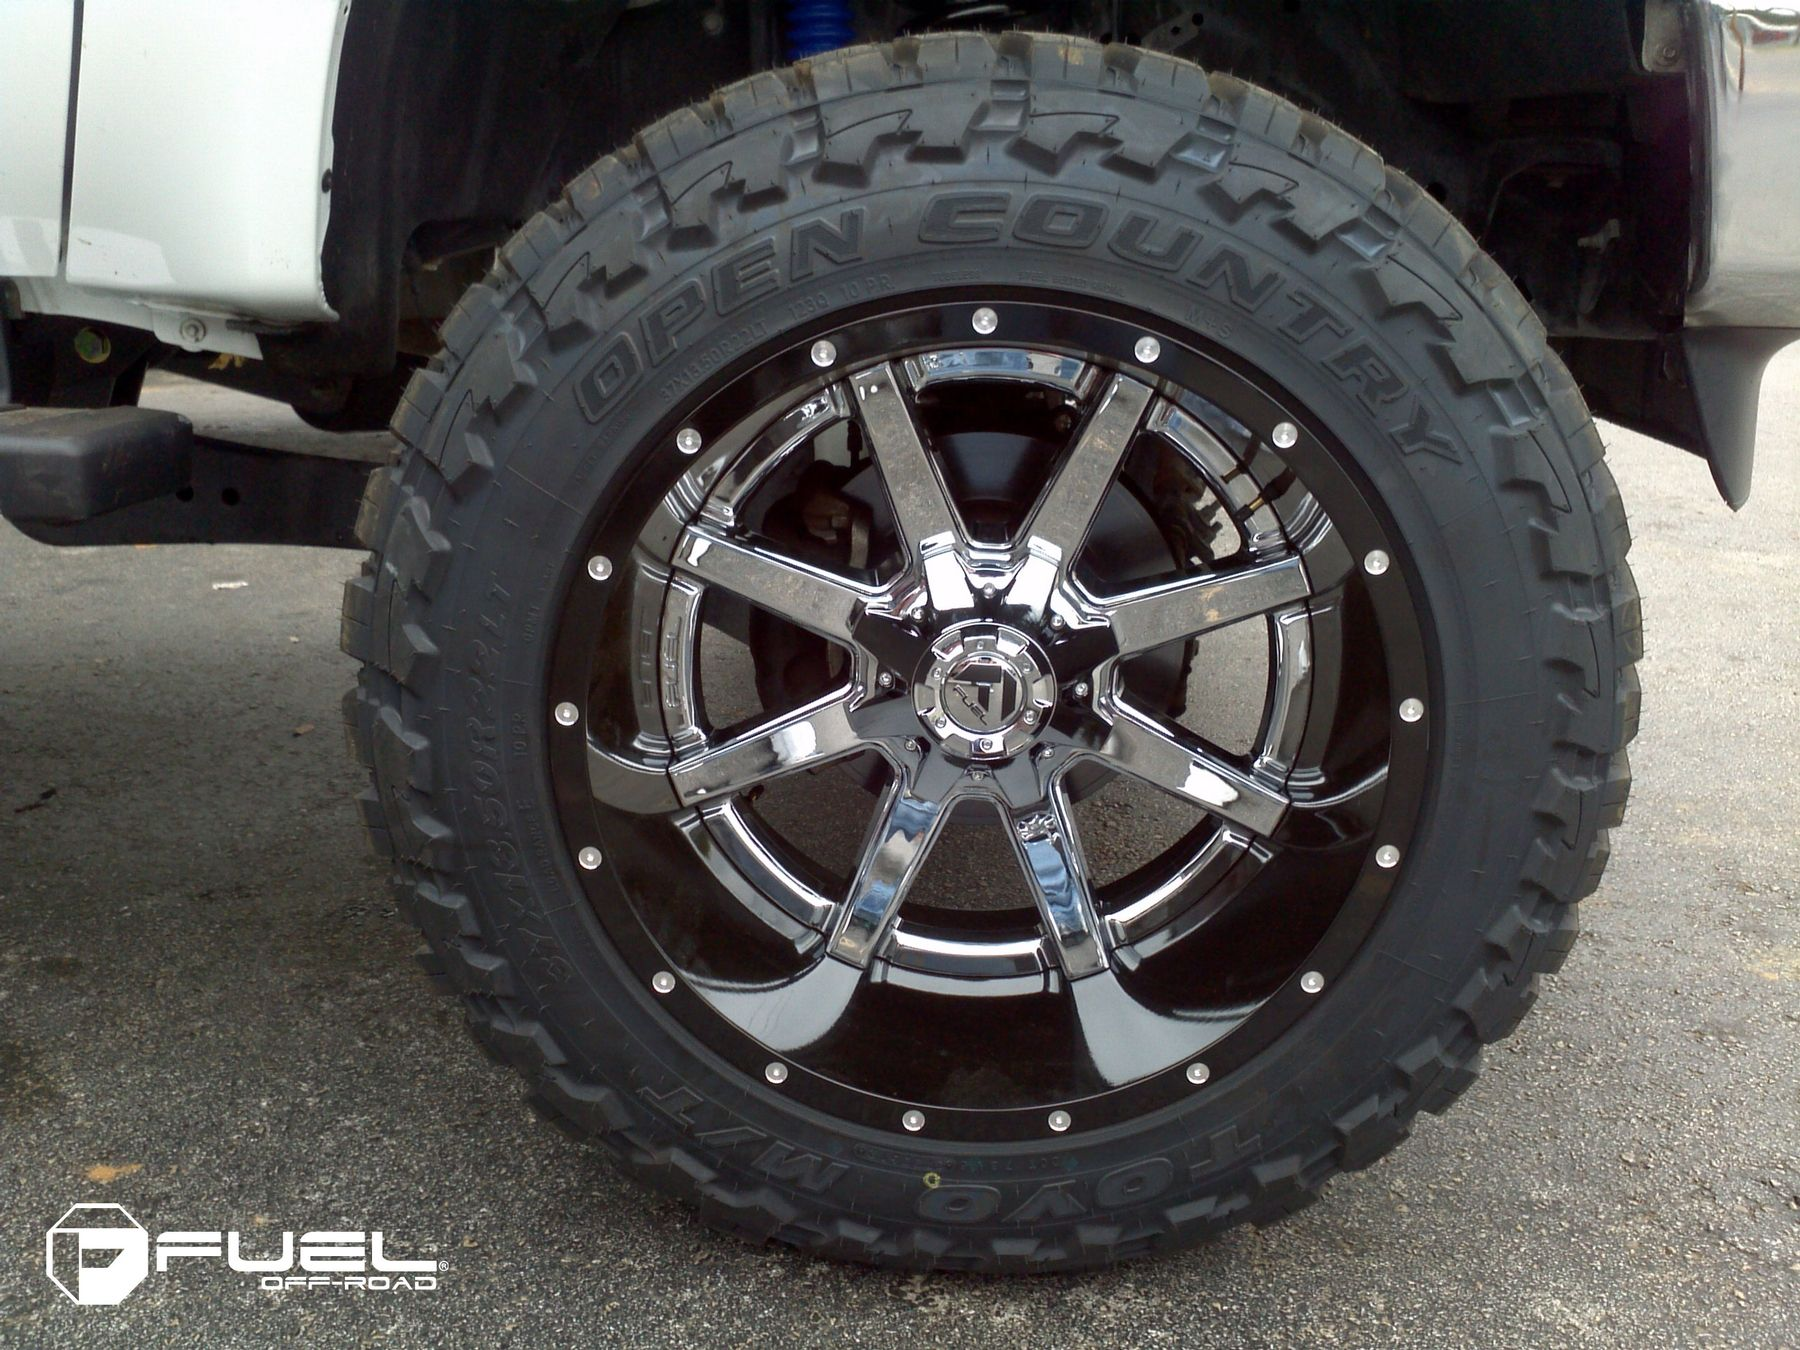 Maverick D260 22 inch Chrome Wheels, tires, Wheel